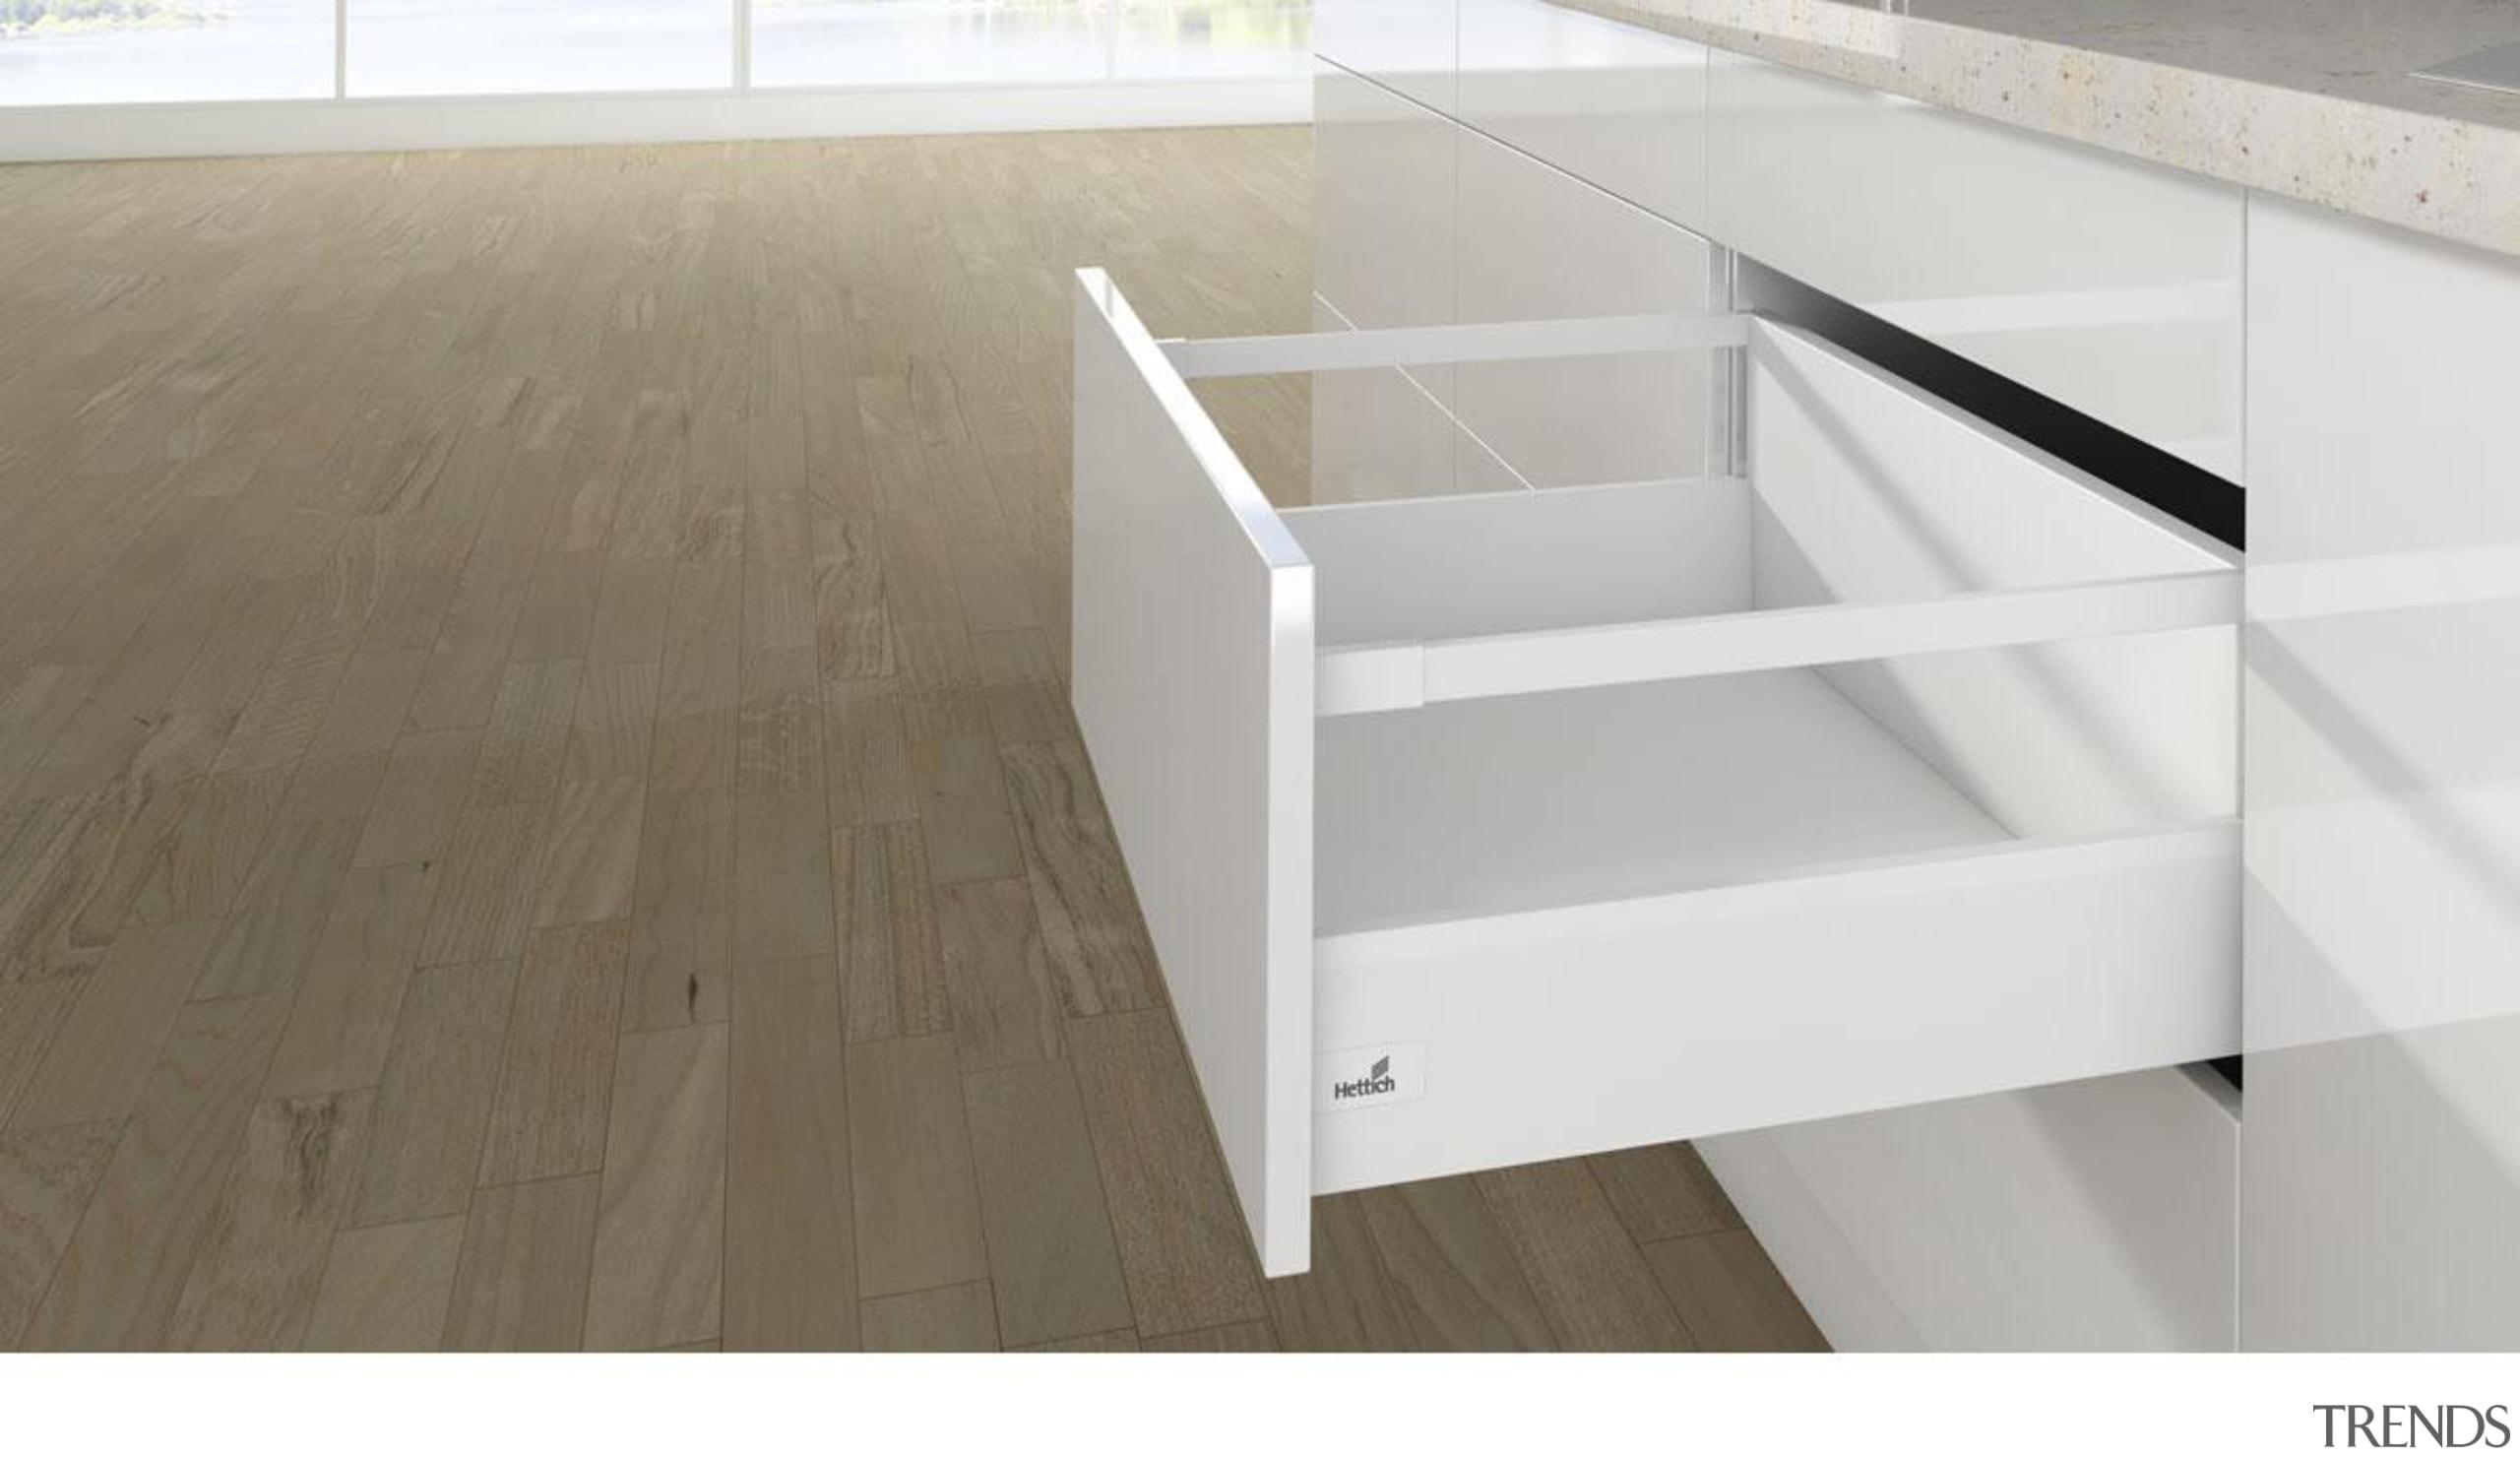 Lengthwise railing - Lengthwise railing - drawer | drawer, floor, furniture, plywood, product, product design, table, white